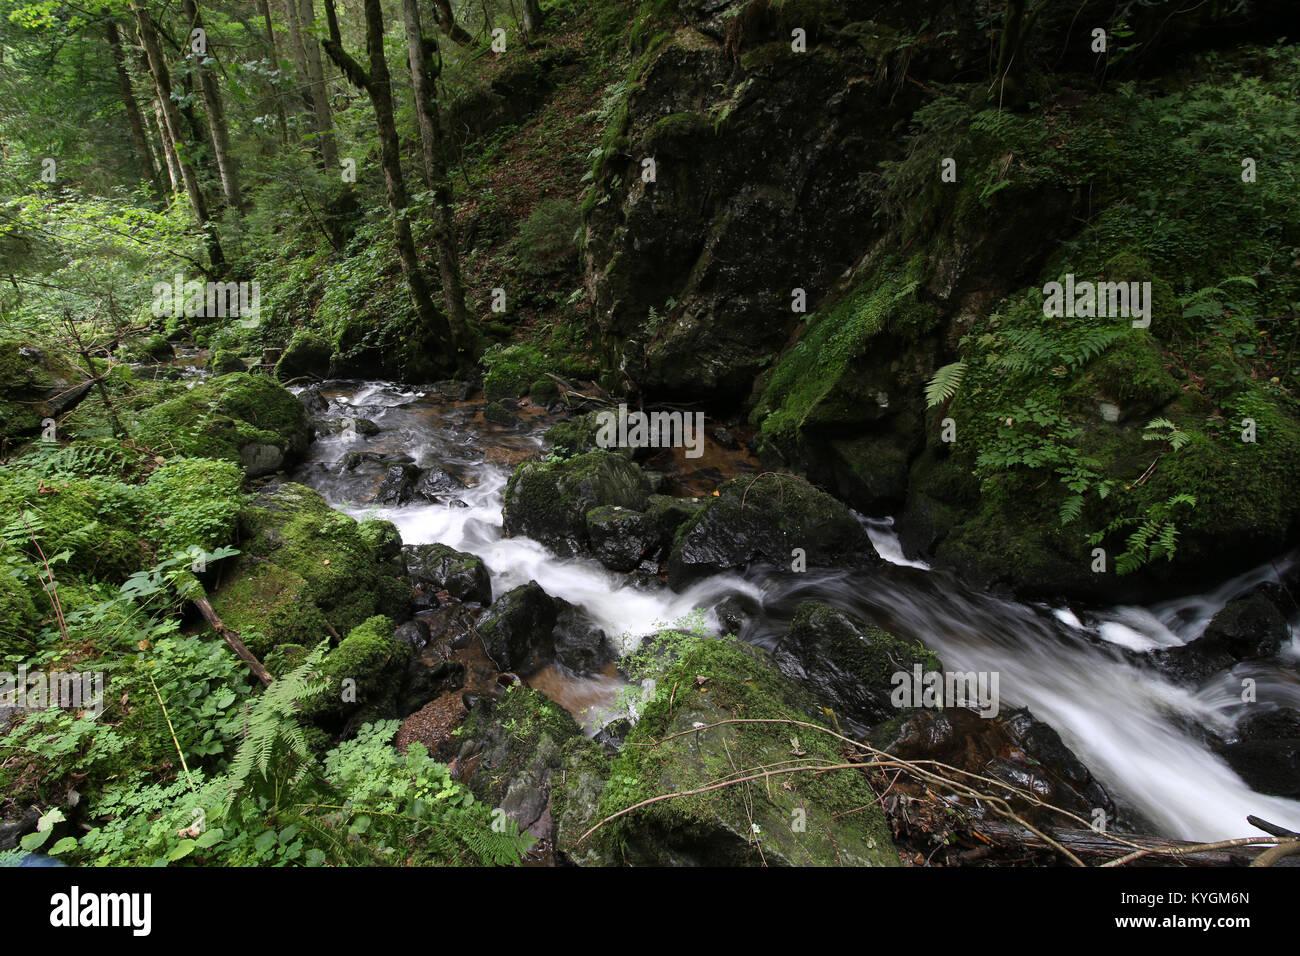 Waterfalls in Baden-Württemberg, Germany - Stock Image